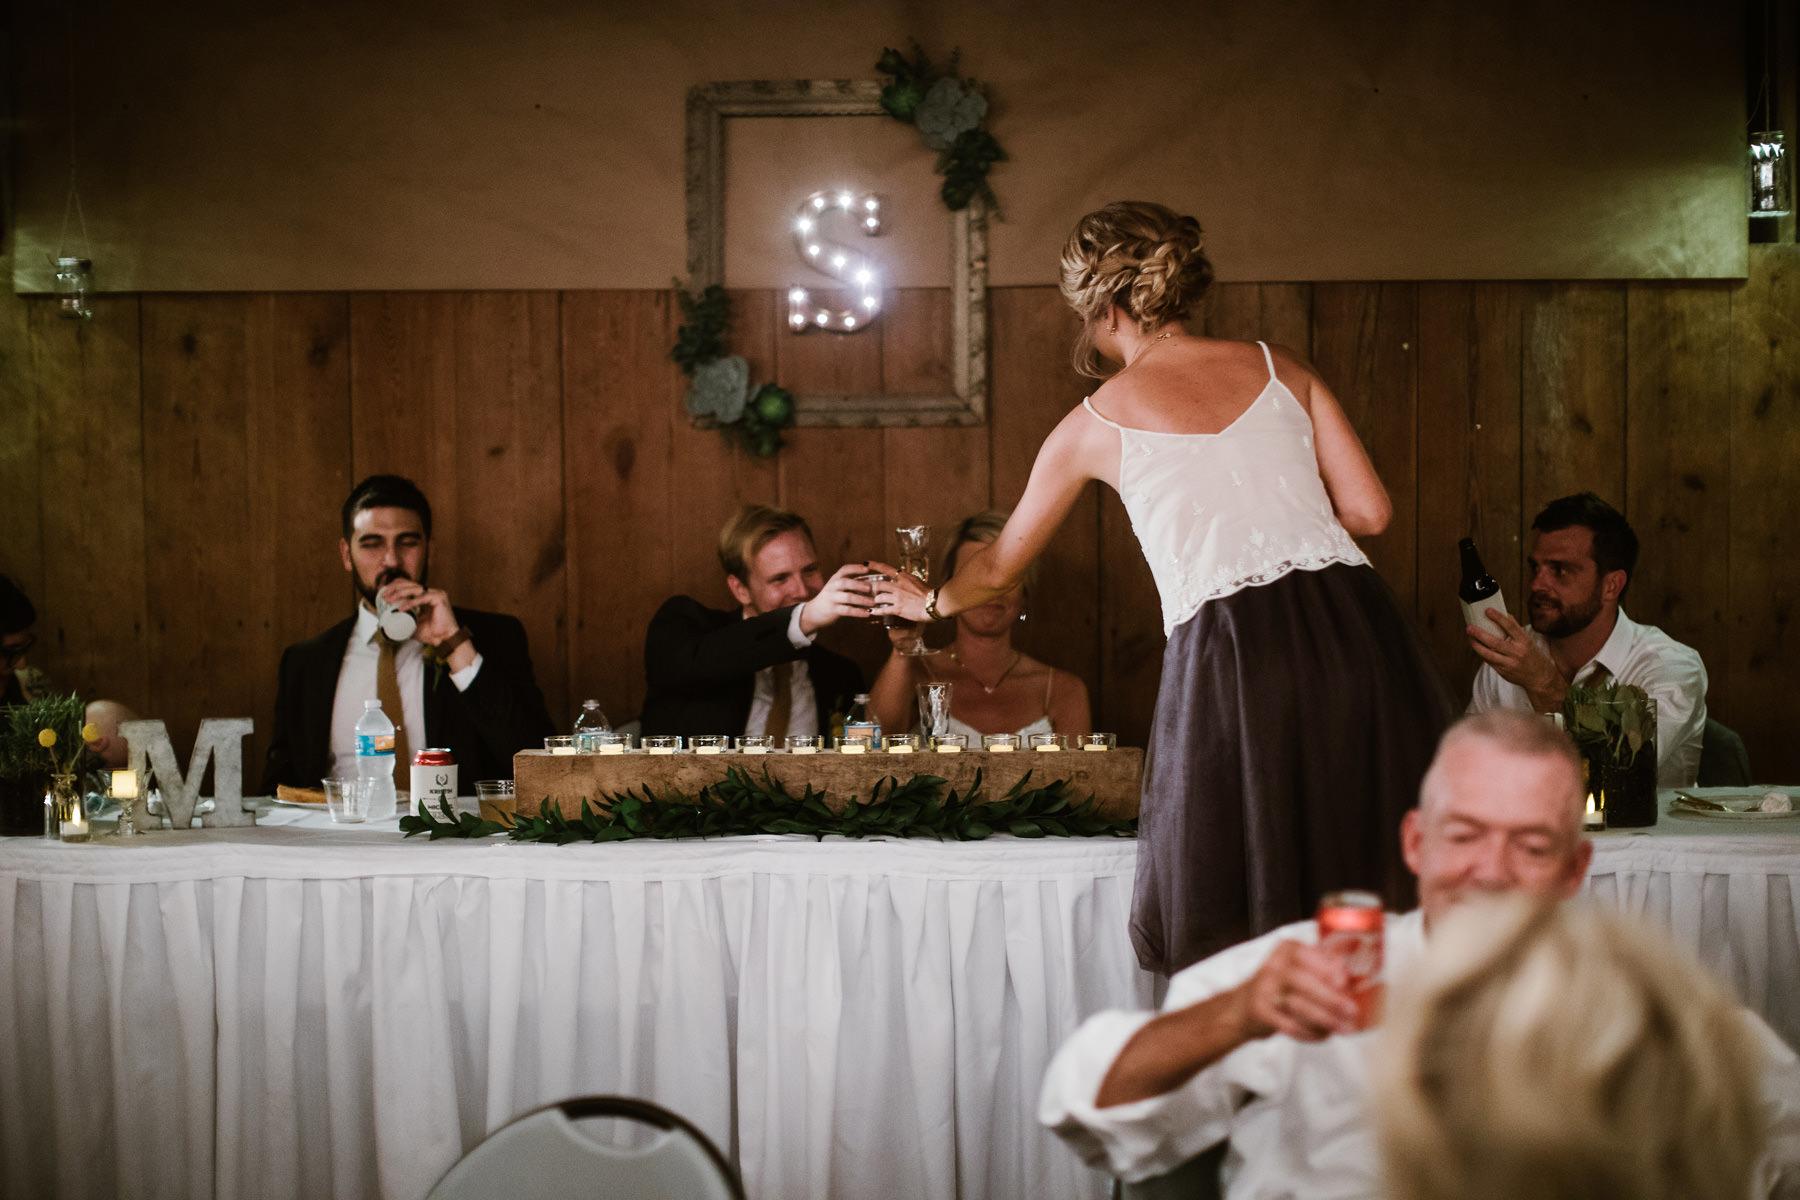 Alldredge Orchard Kansas City_Kindling Wedding Photography BLOG 71.JPG